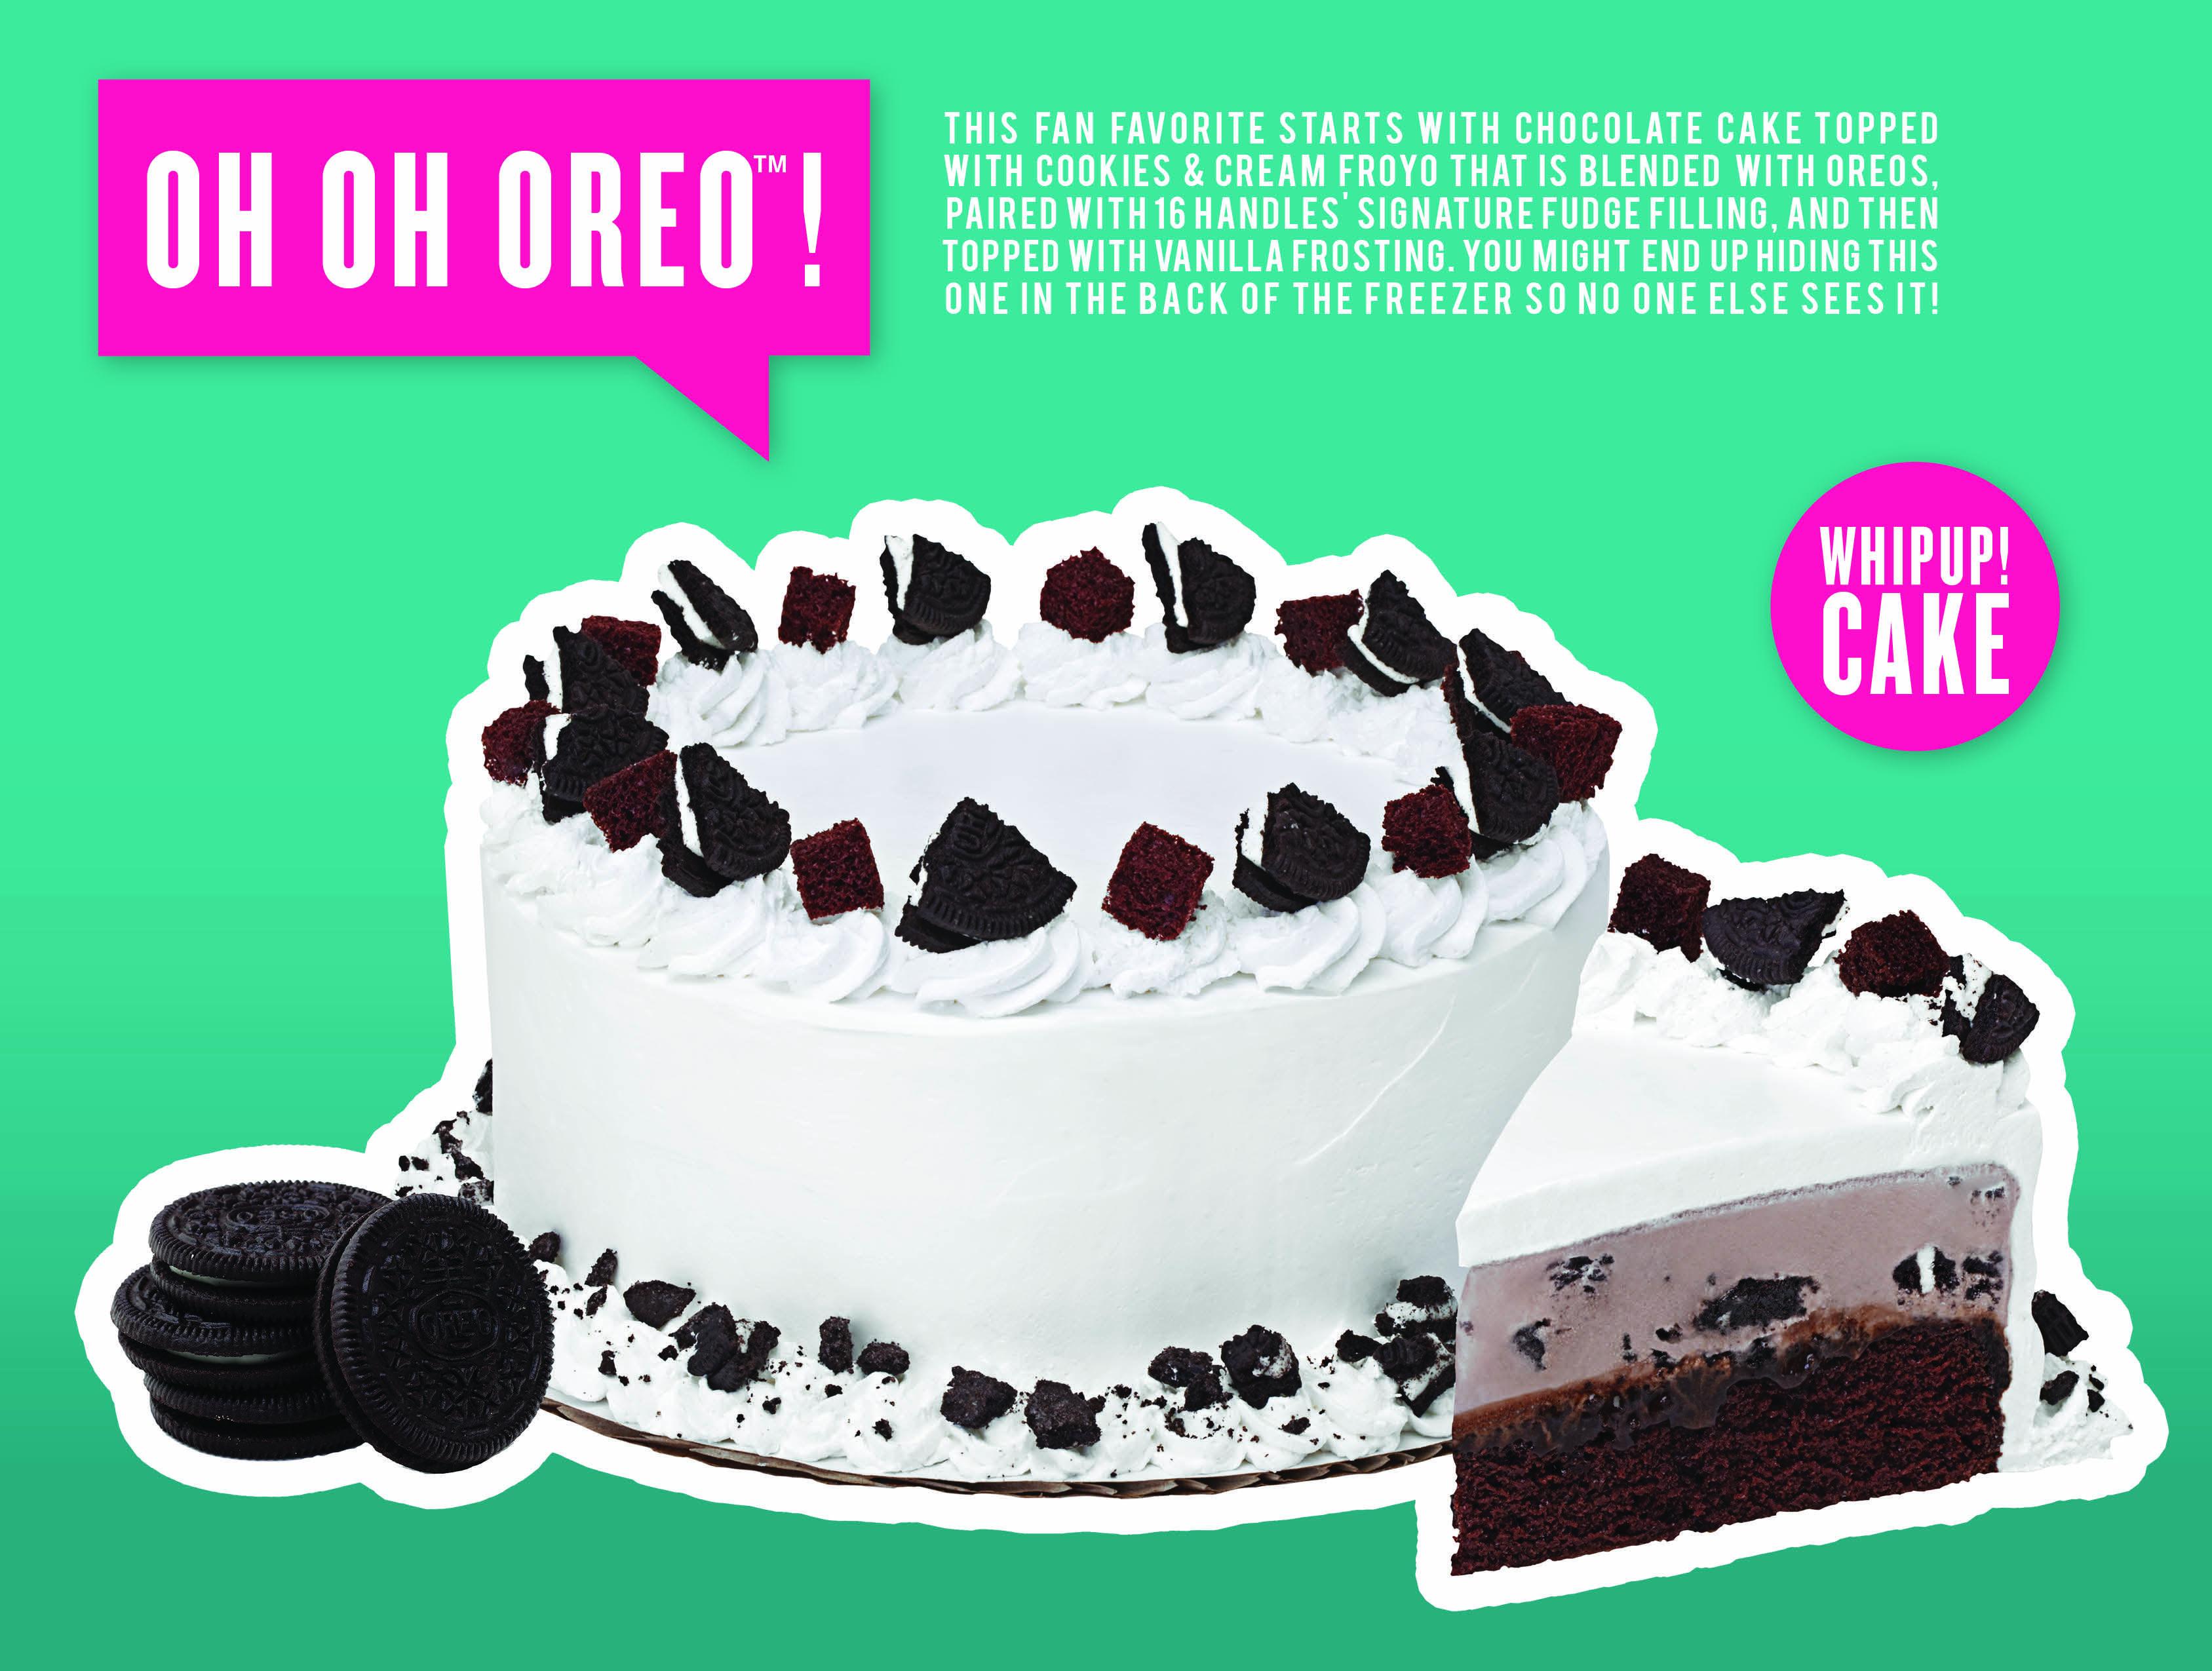 Astounding Oh Oh Oreo Whipup Froyo Cake Cake Toppings Cake Oreo Funny Birthday Cards Online Fluifree Goldxyz